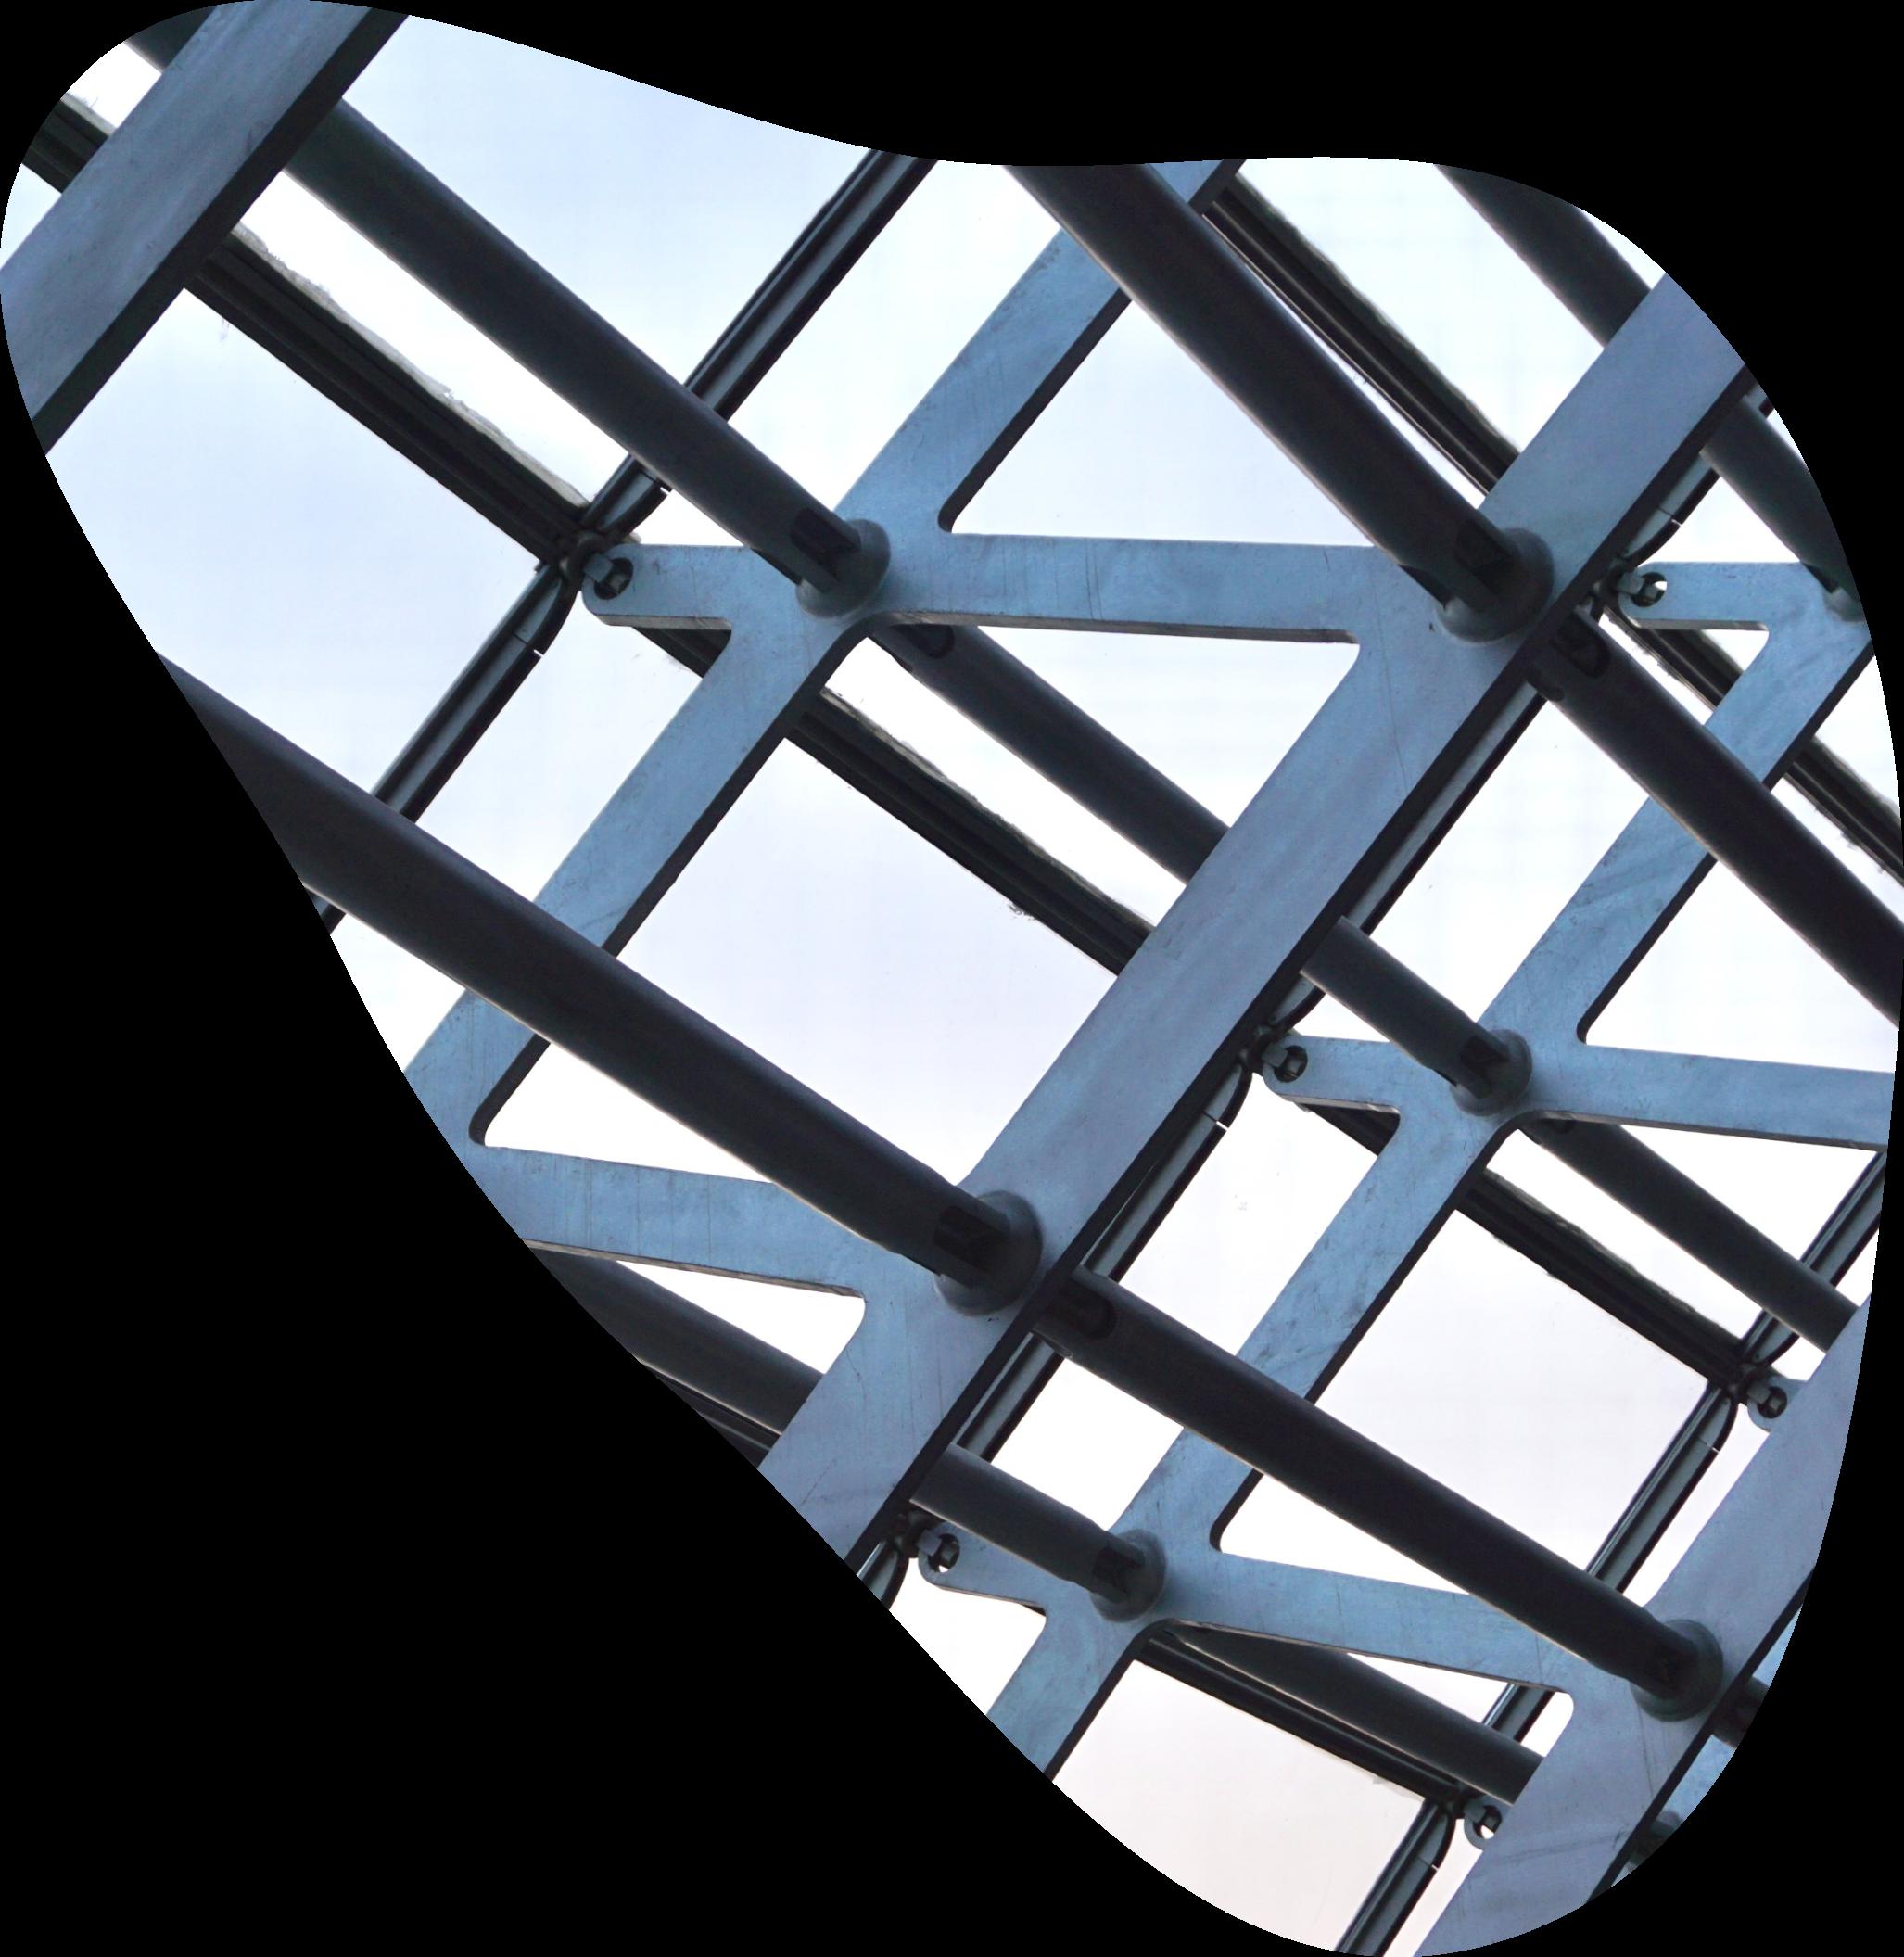 Wizata - Industries - Metals & Minerals - Blob